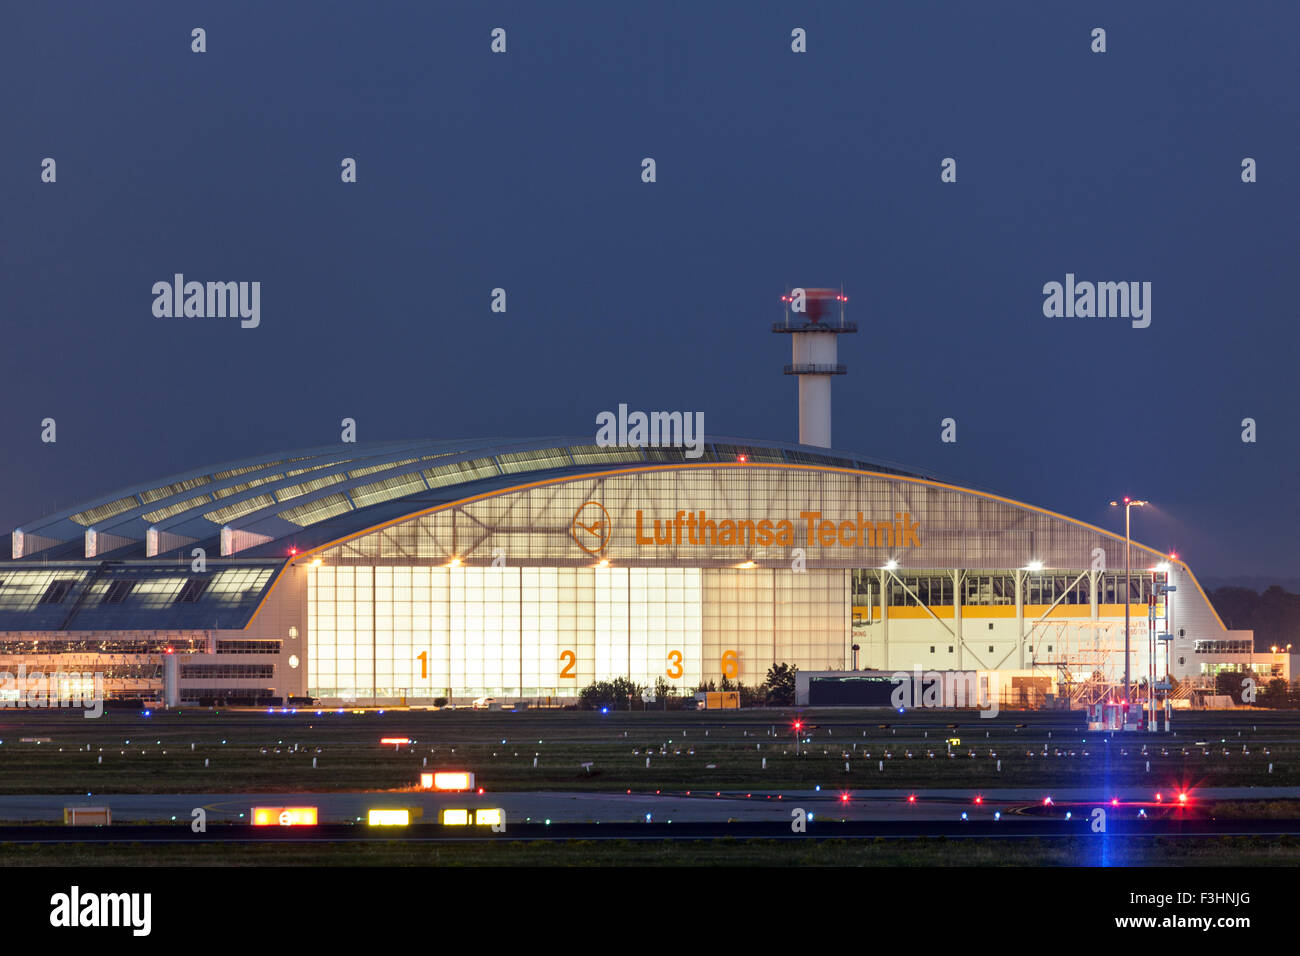 Lufthansa technique Hangar at the Frankfurt Airport Stock Photo